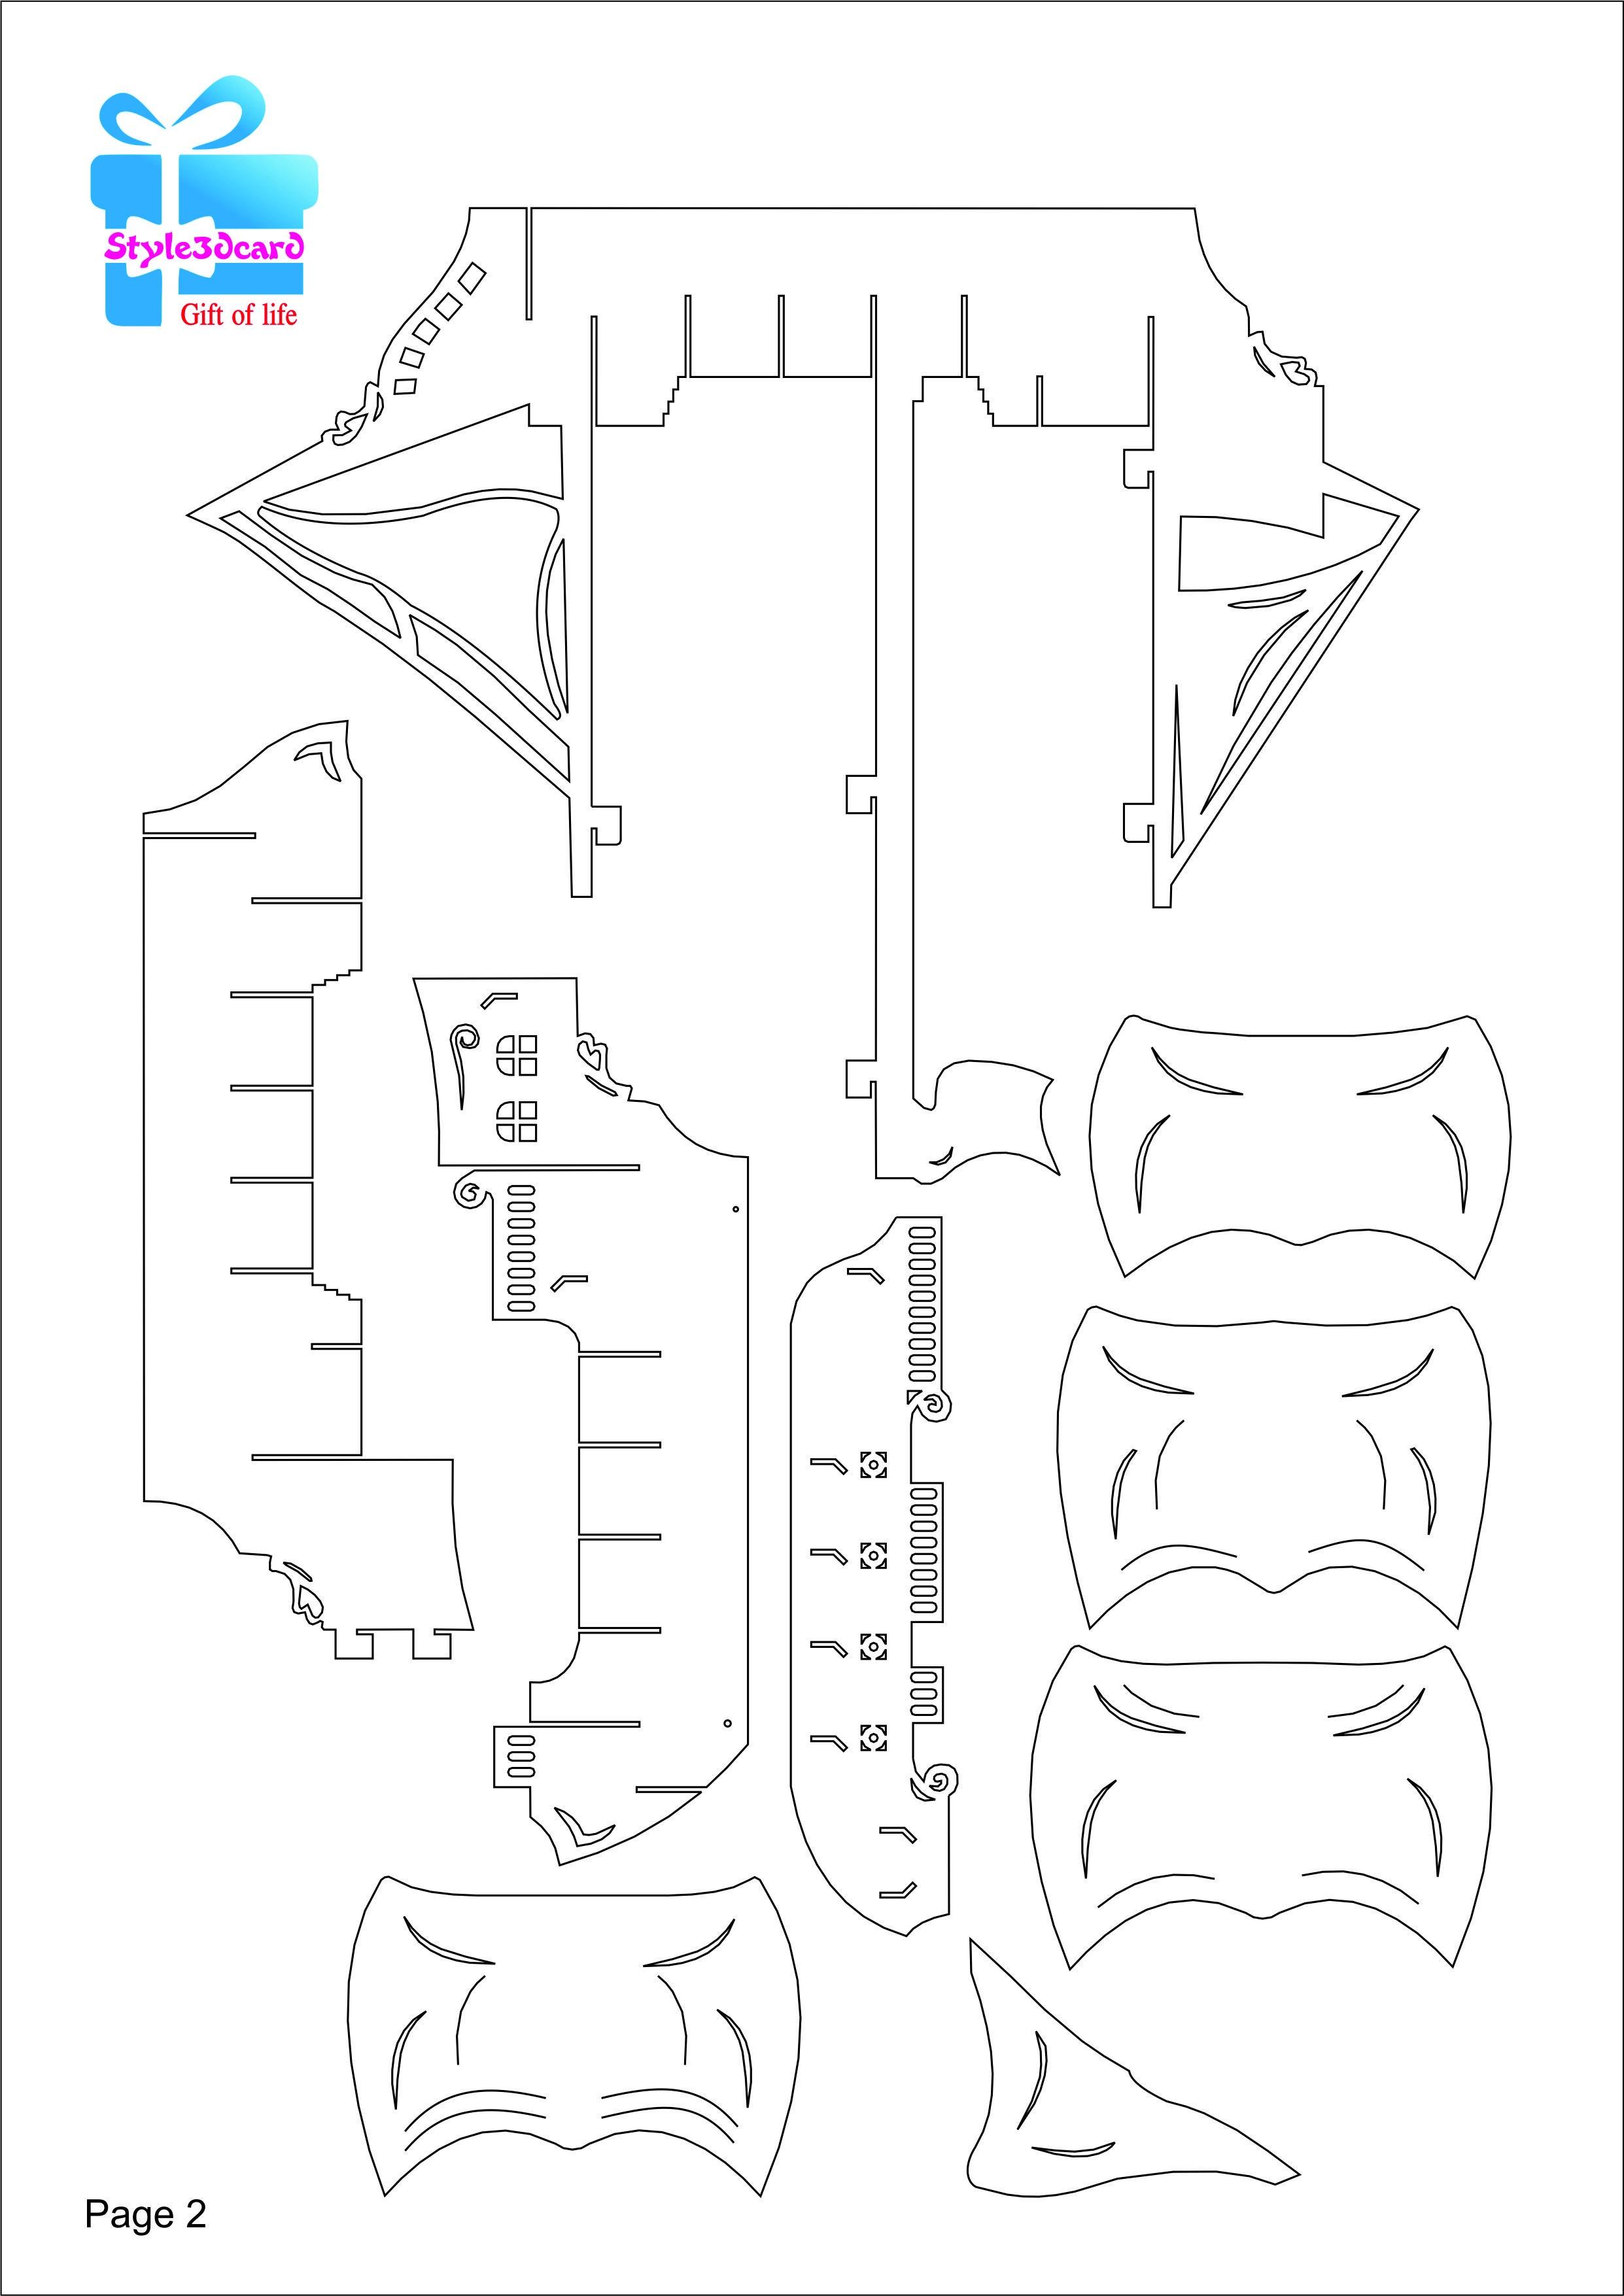 Pirate Ship 3D Pop-Up /kirigami Pattern 3   Pop-Up I Kirigami - Free Printable Kirigami Pop Up Card Patterns